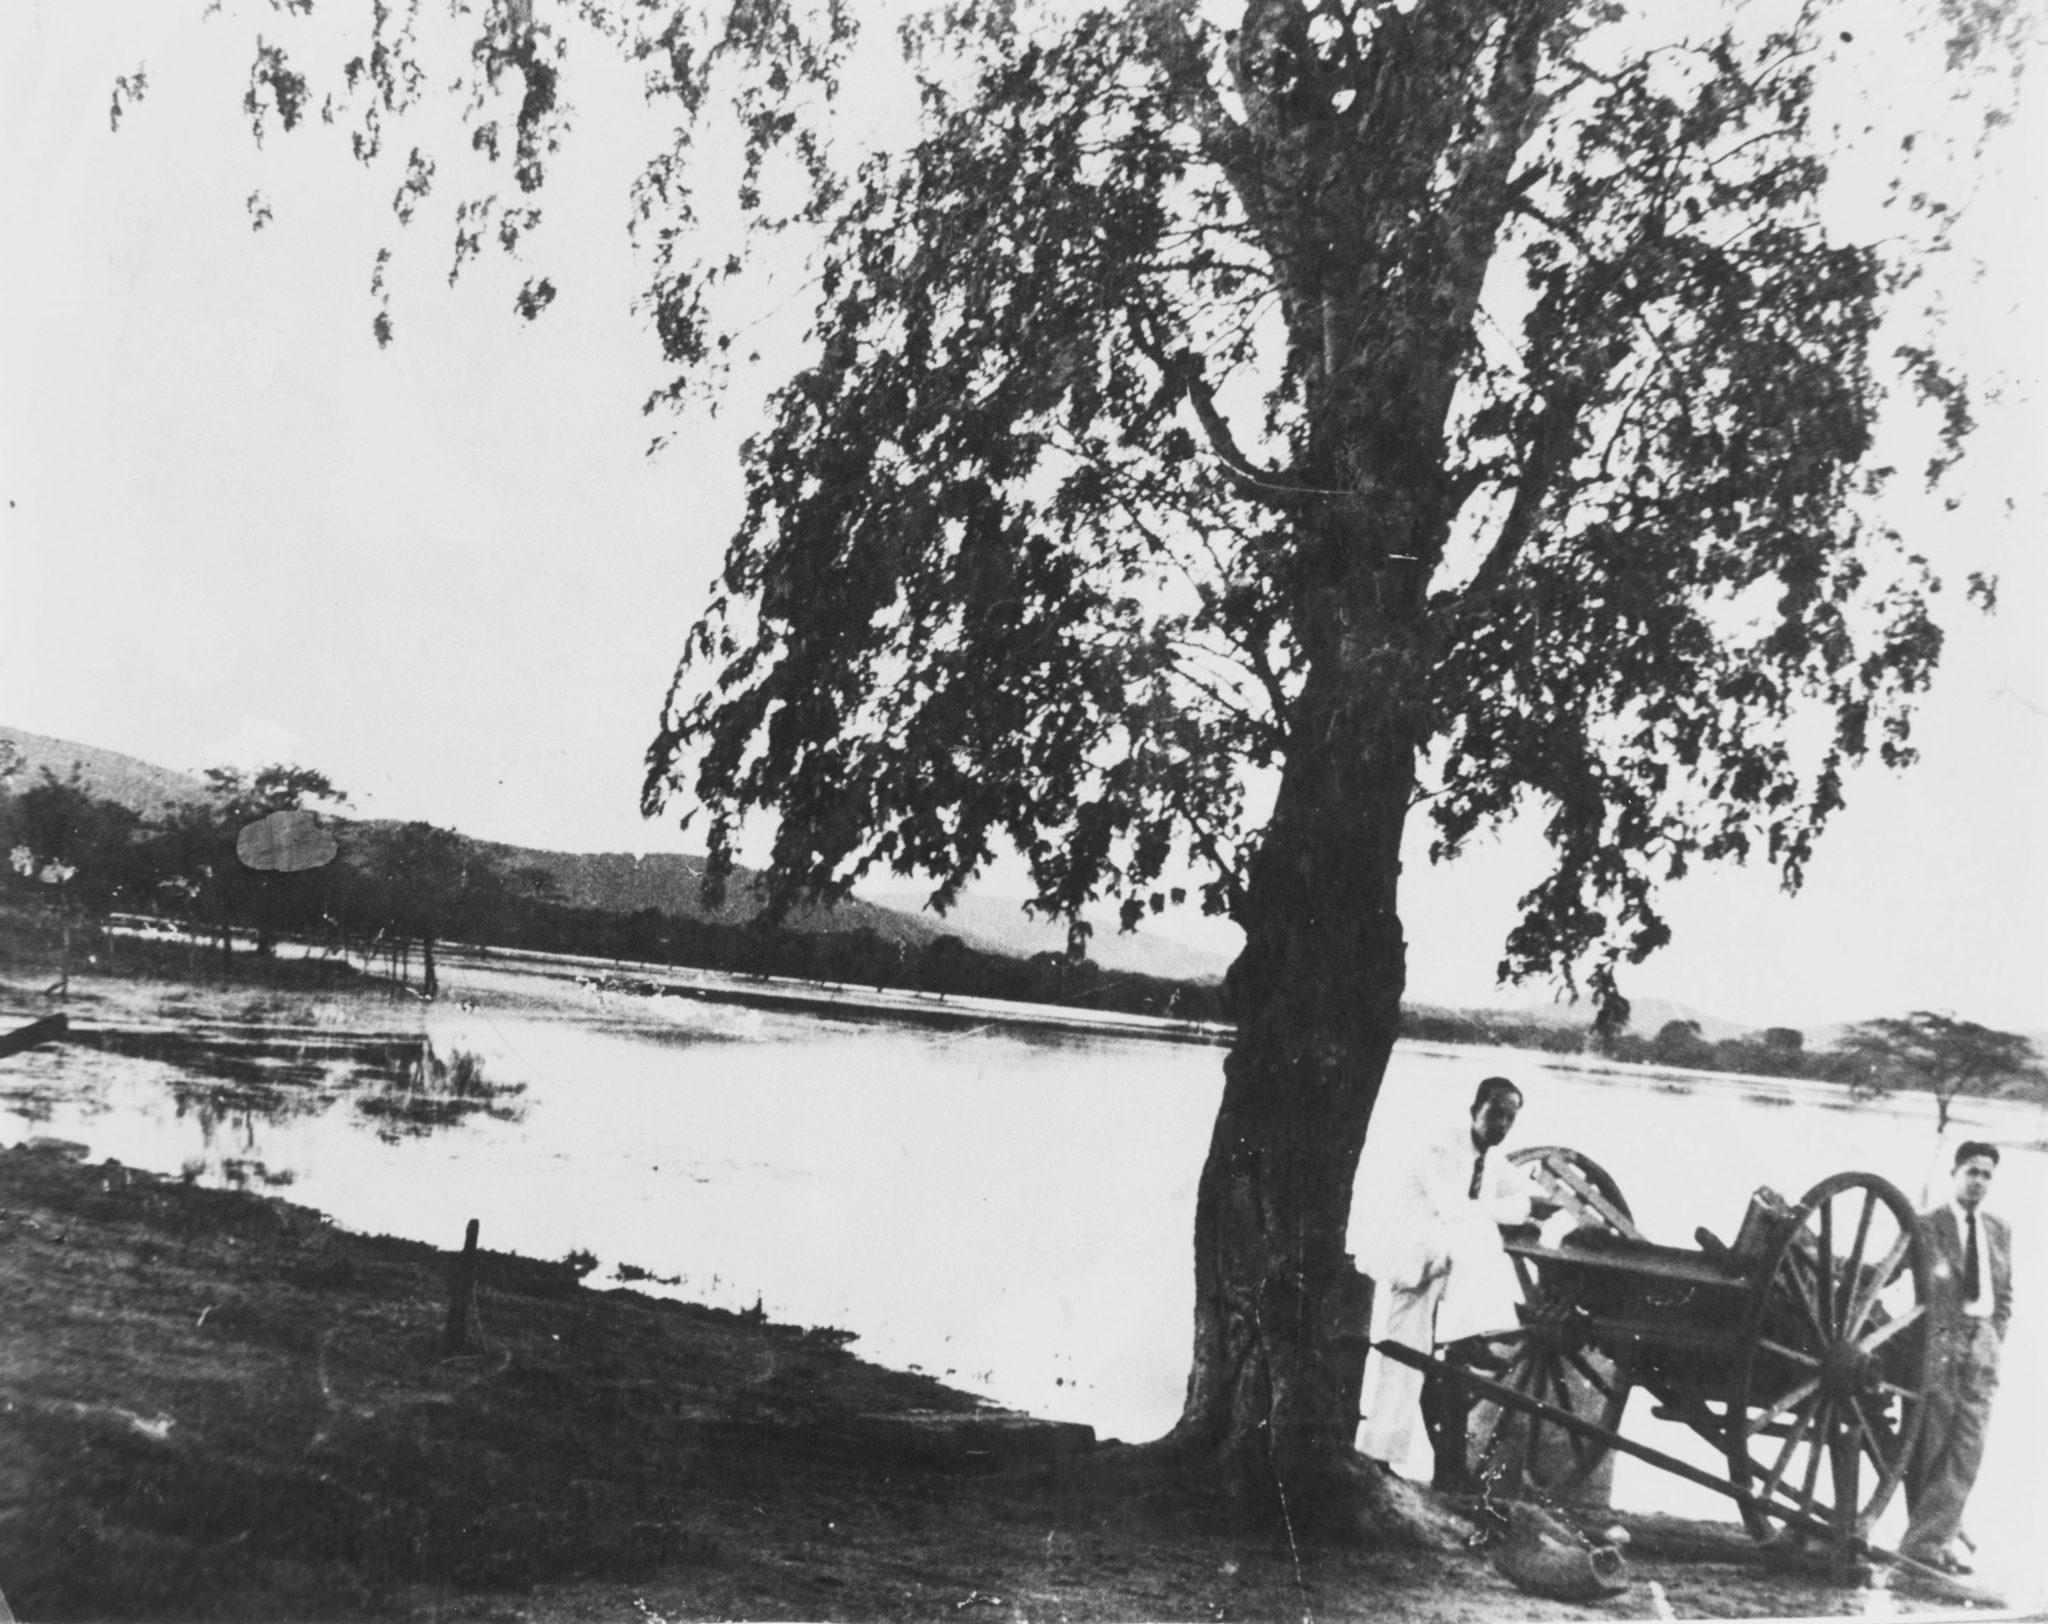 La laguna de Patarata